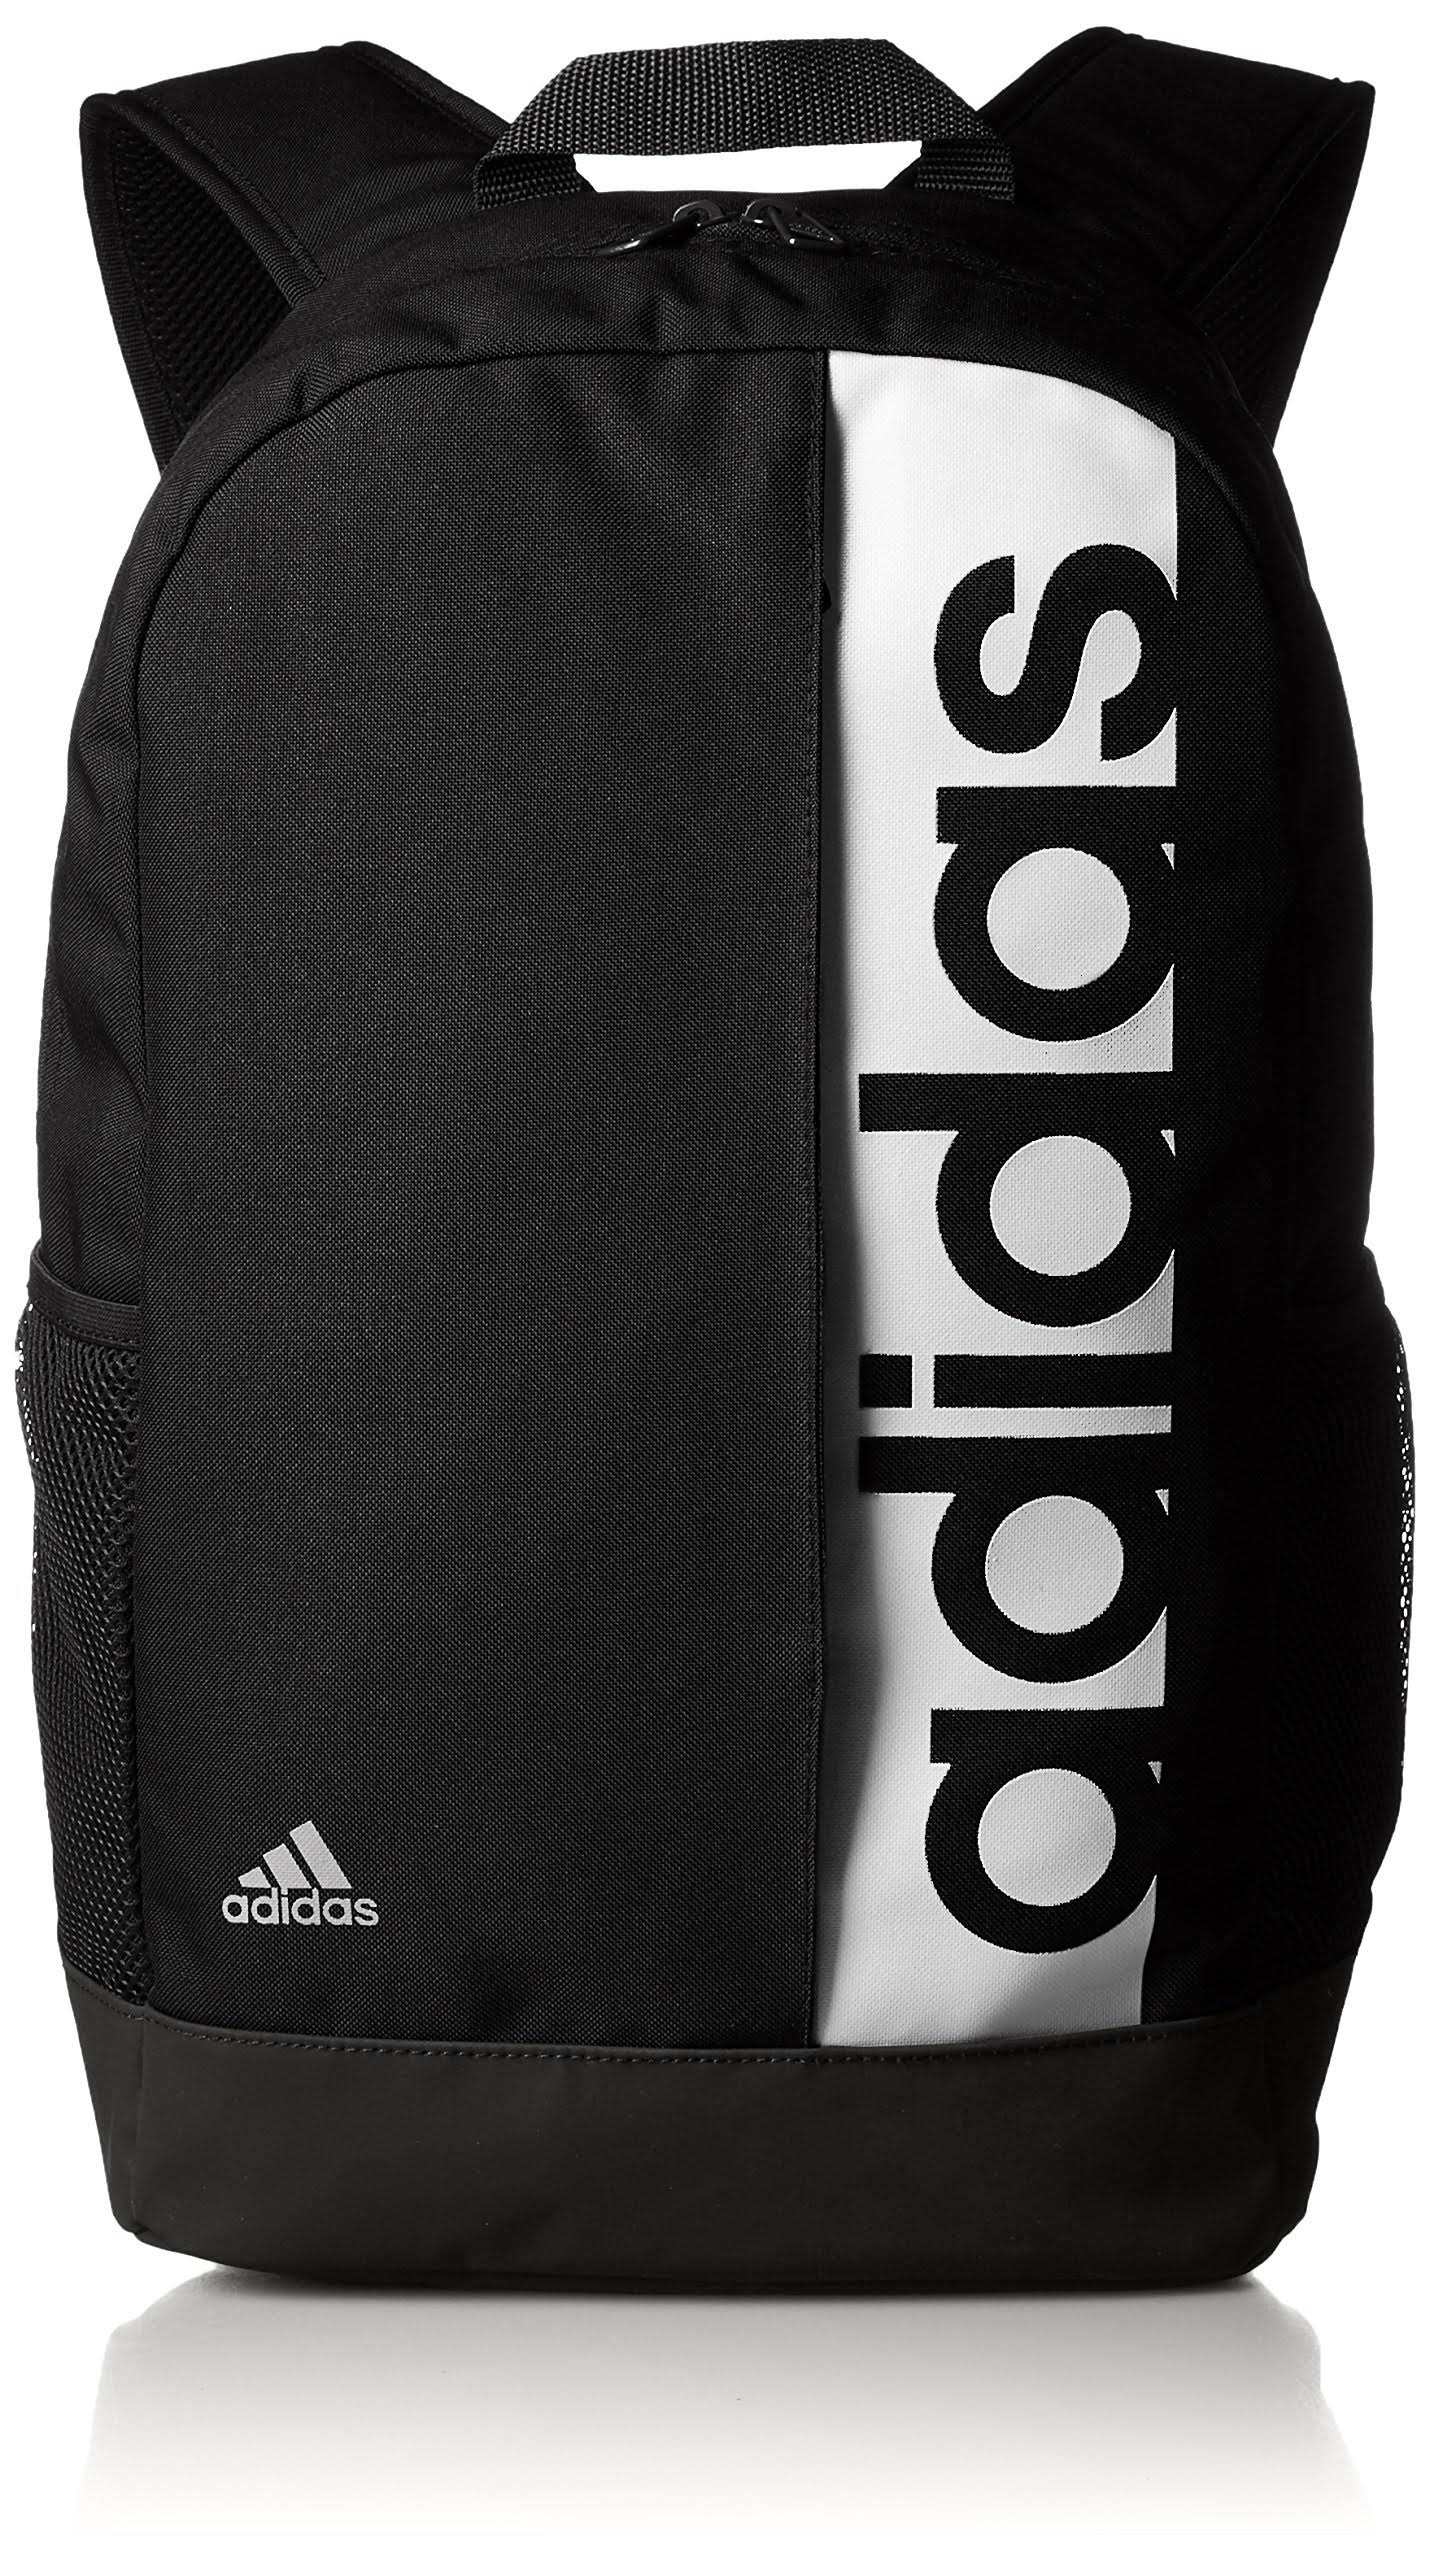 Linear Bvb Adidas 25 Negro S99967 Mochila Blanco Logo Luc Fgqwq5Op